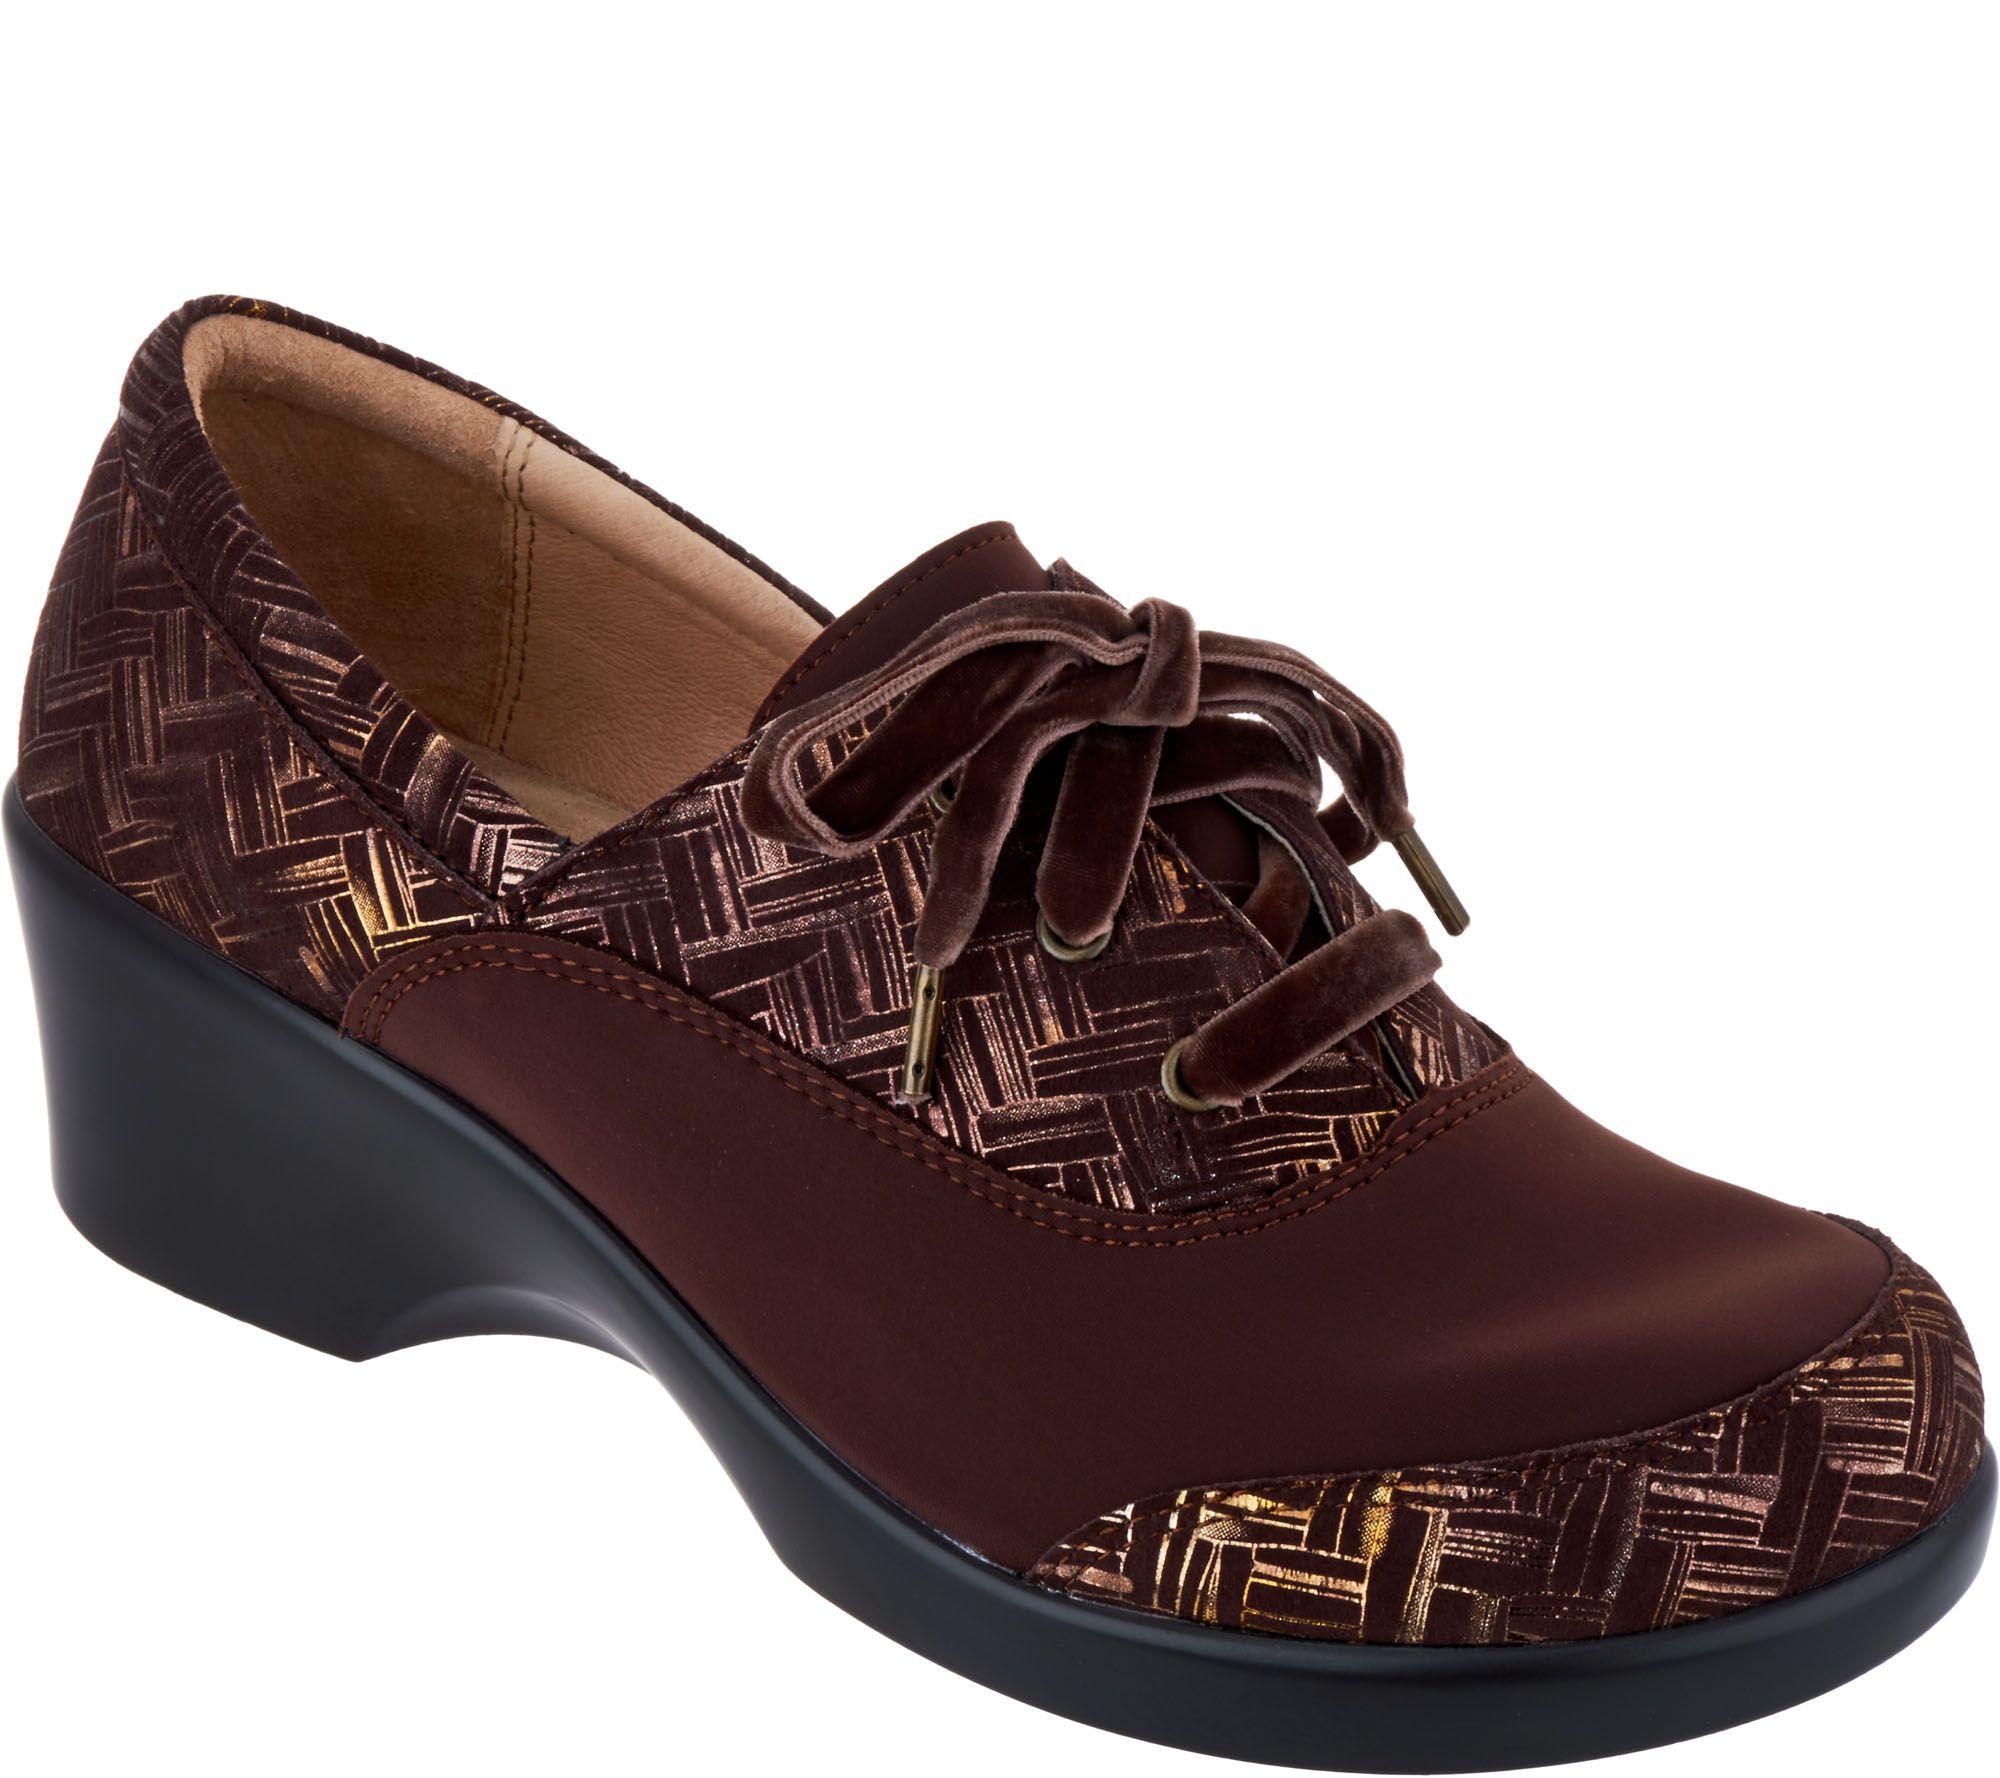 nurses thenerdynurse pinterest best on nursing nurse comforter nicu comfortable for shoes images gifts most